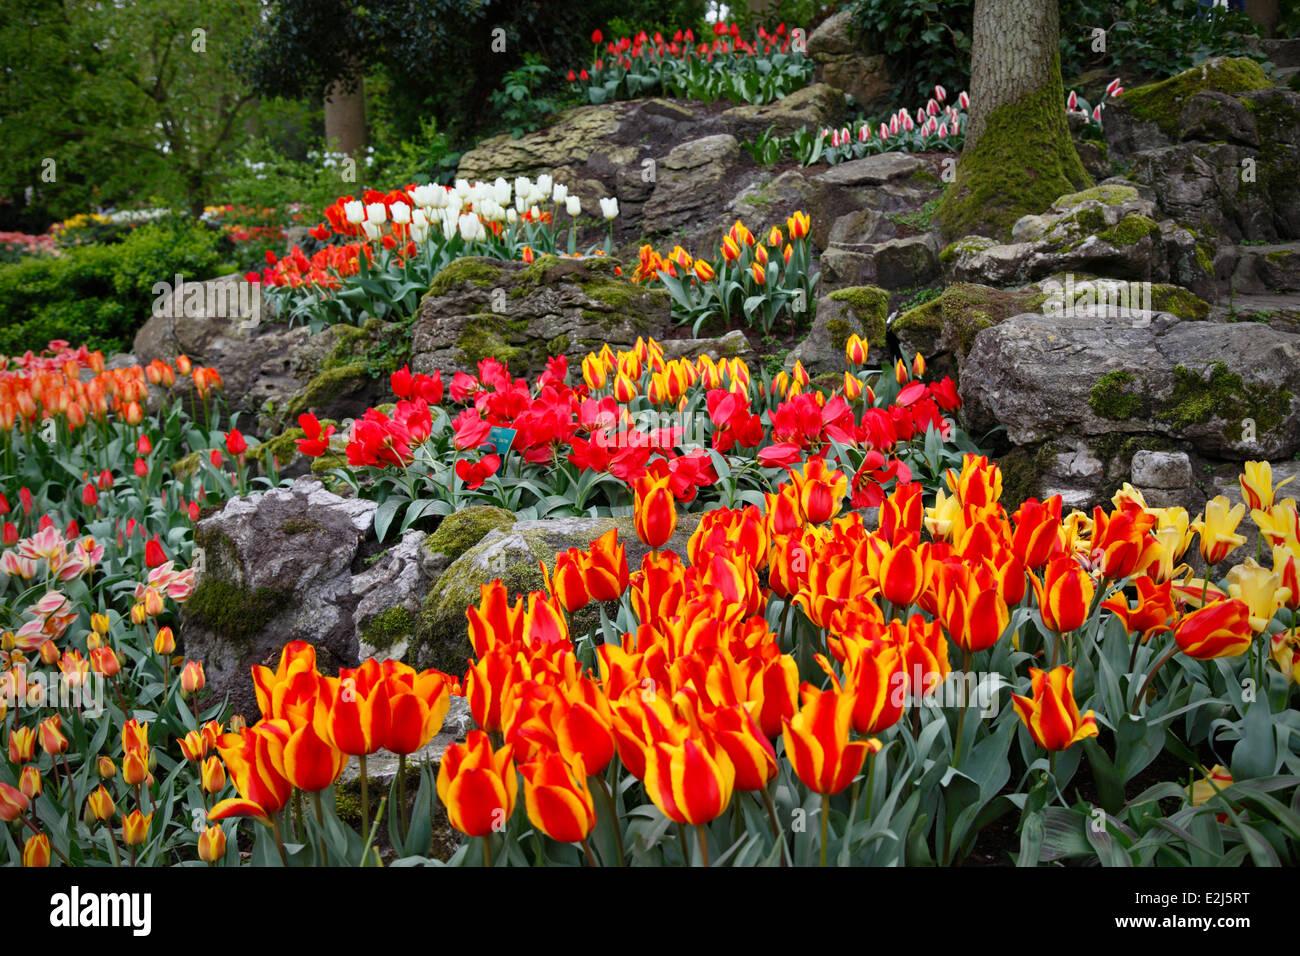 Tulips at Keukenhof Gardens near Lisse in the Netherlands - Stock Image